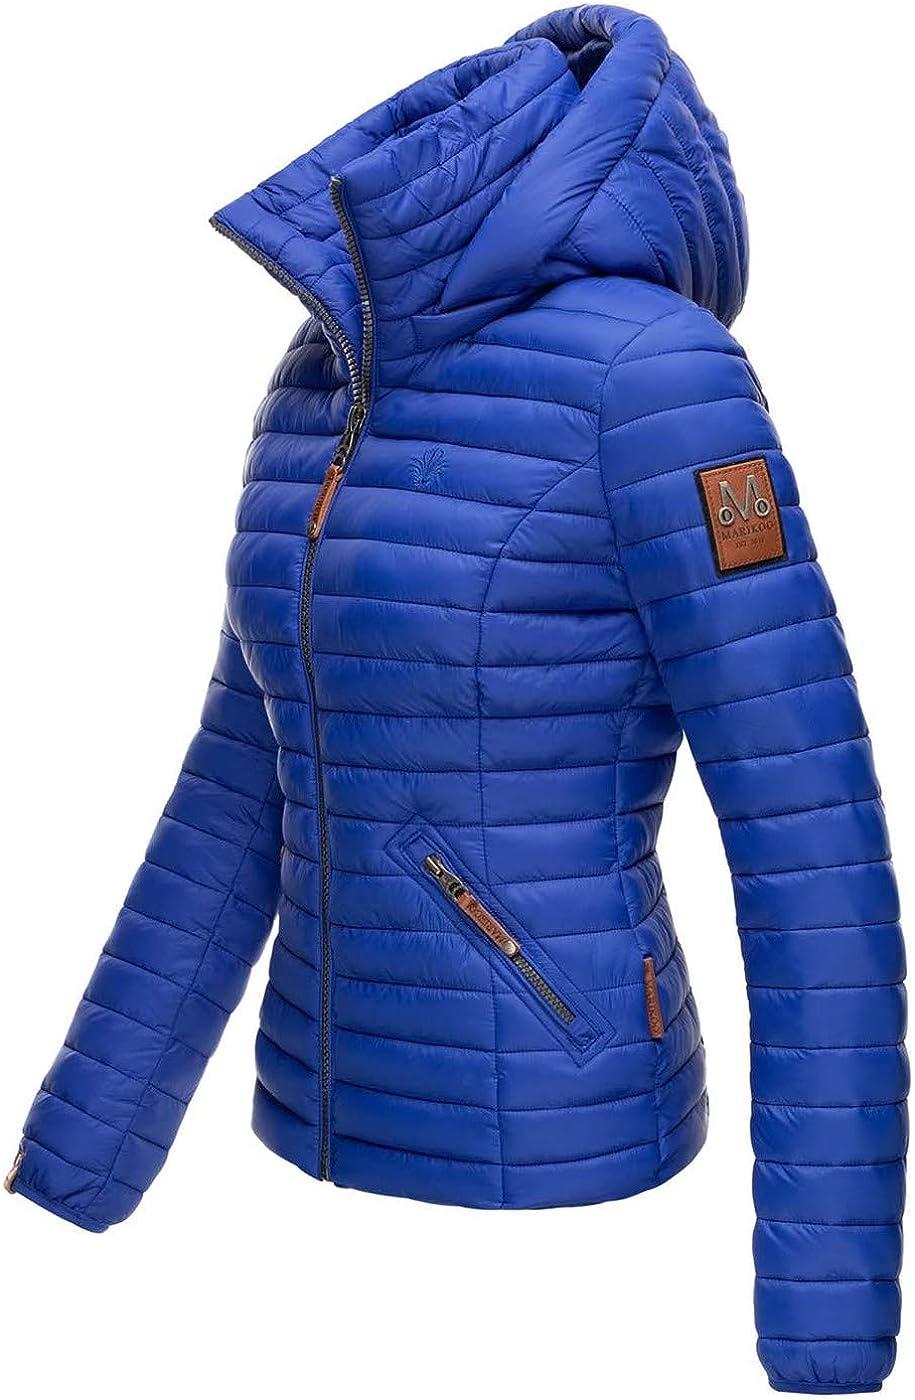 Marikoo Damen Jacke Steppjacke /Übergangsjacke gesteppt B839